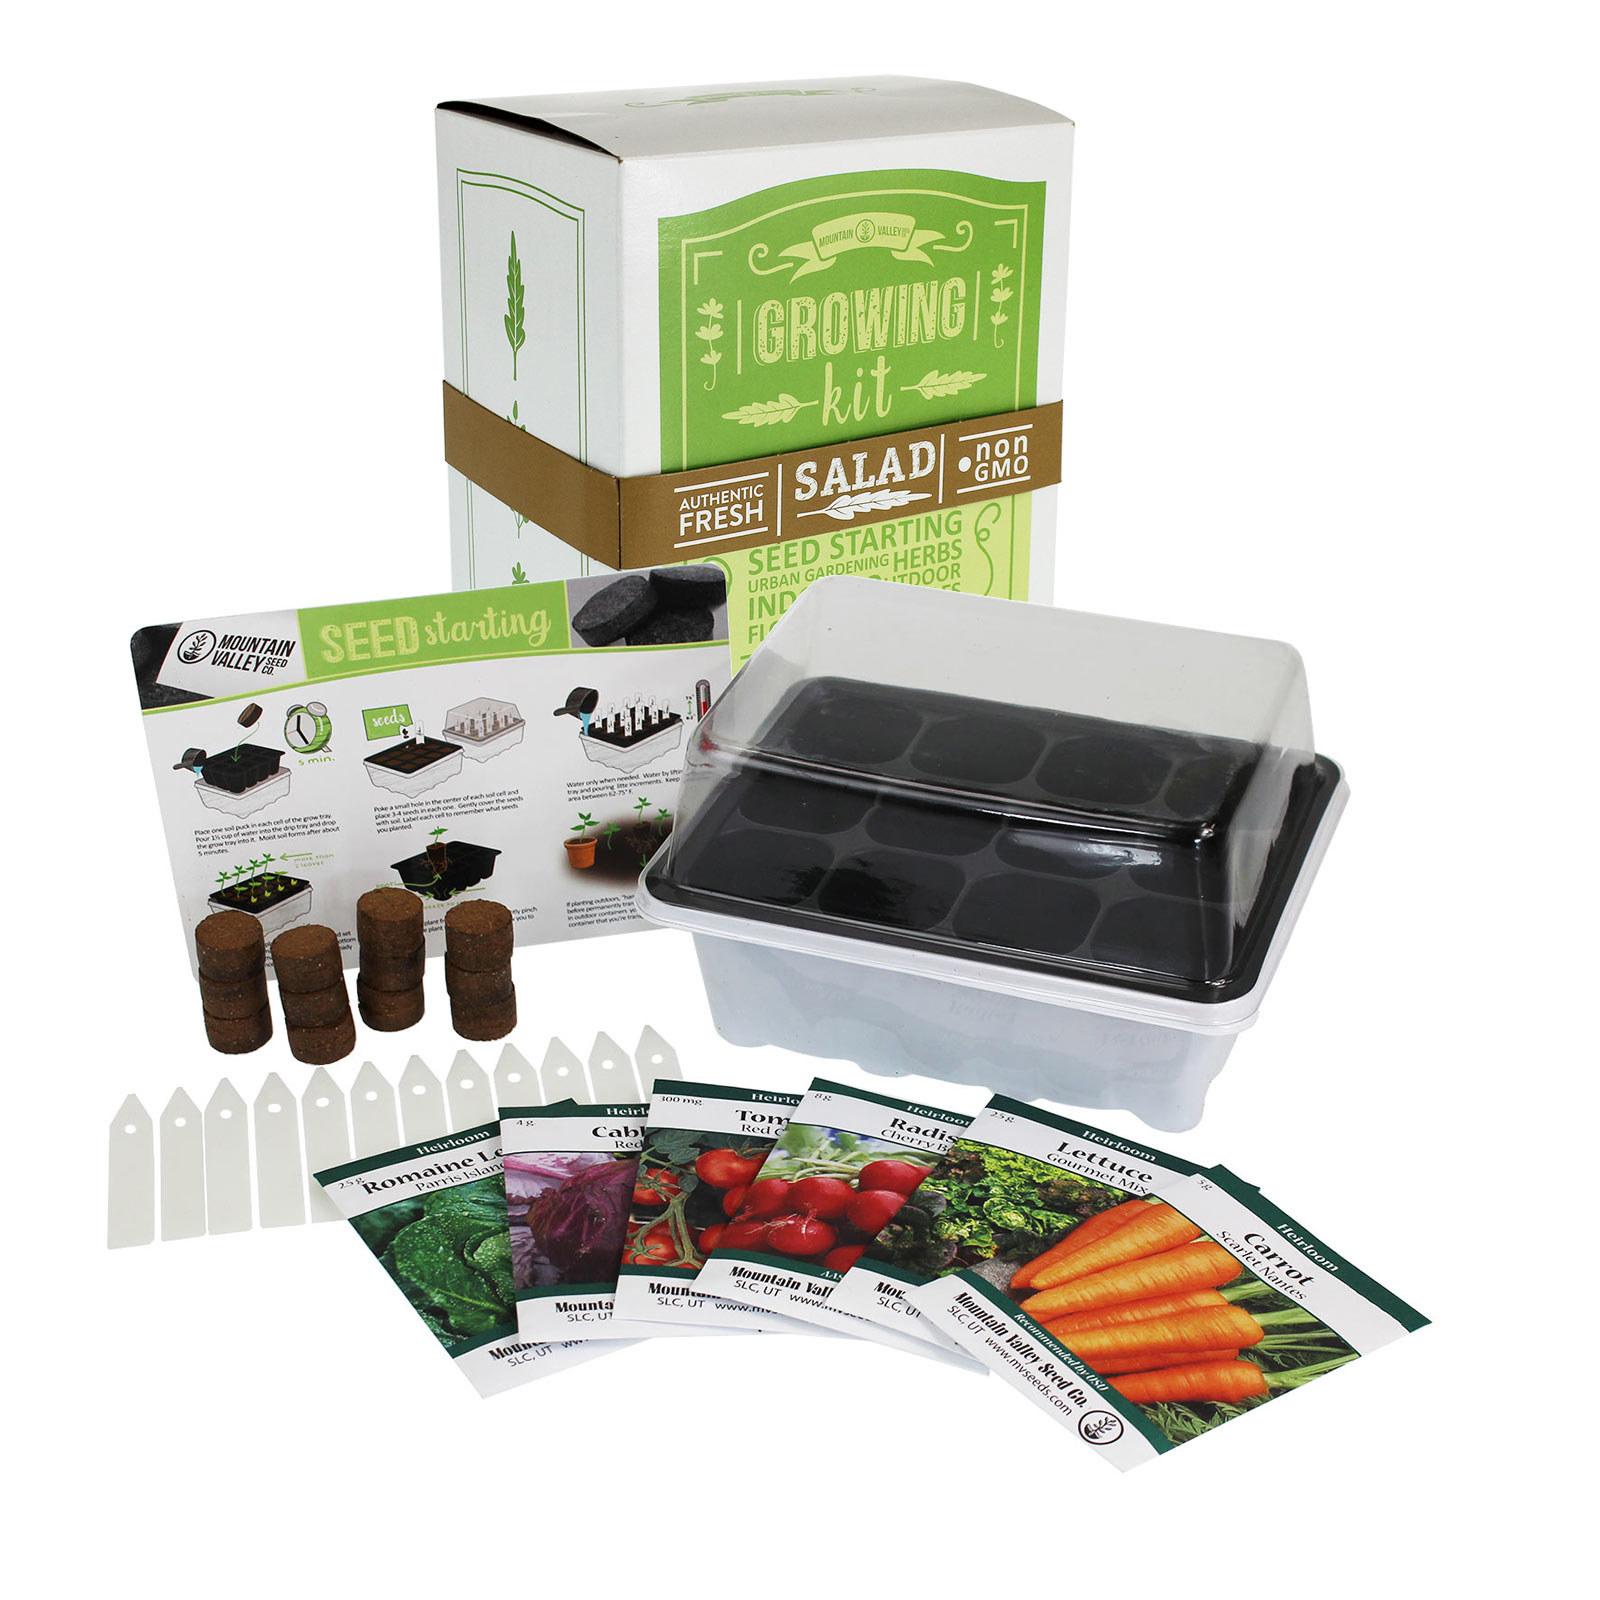 The complete Salad & Vegetable Garden Seed Starter kit